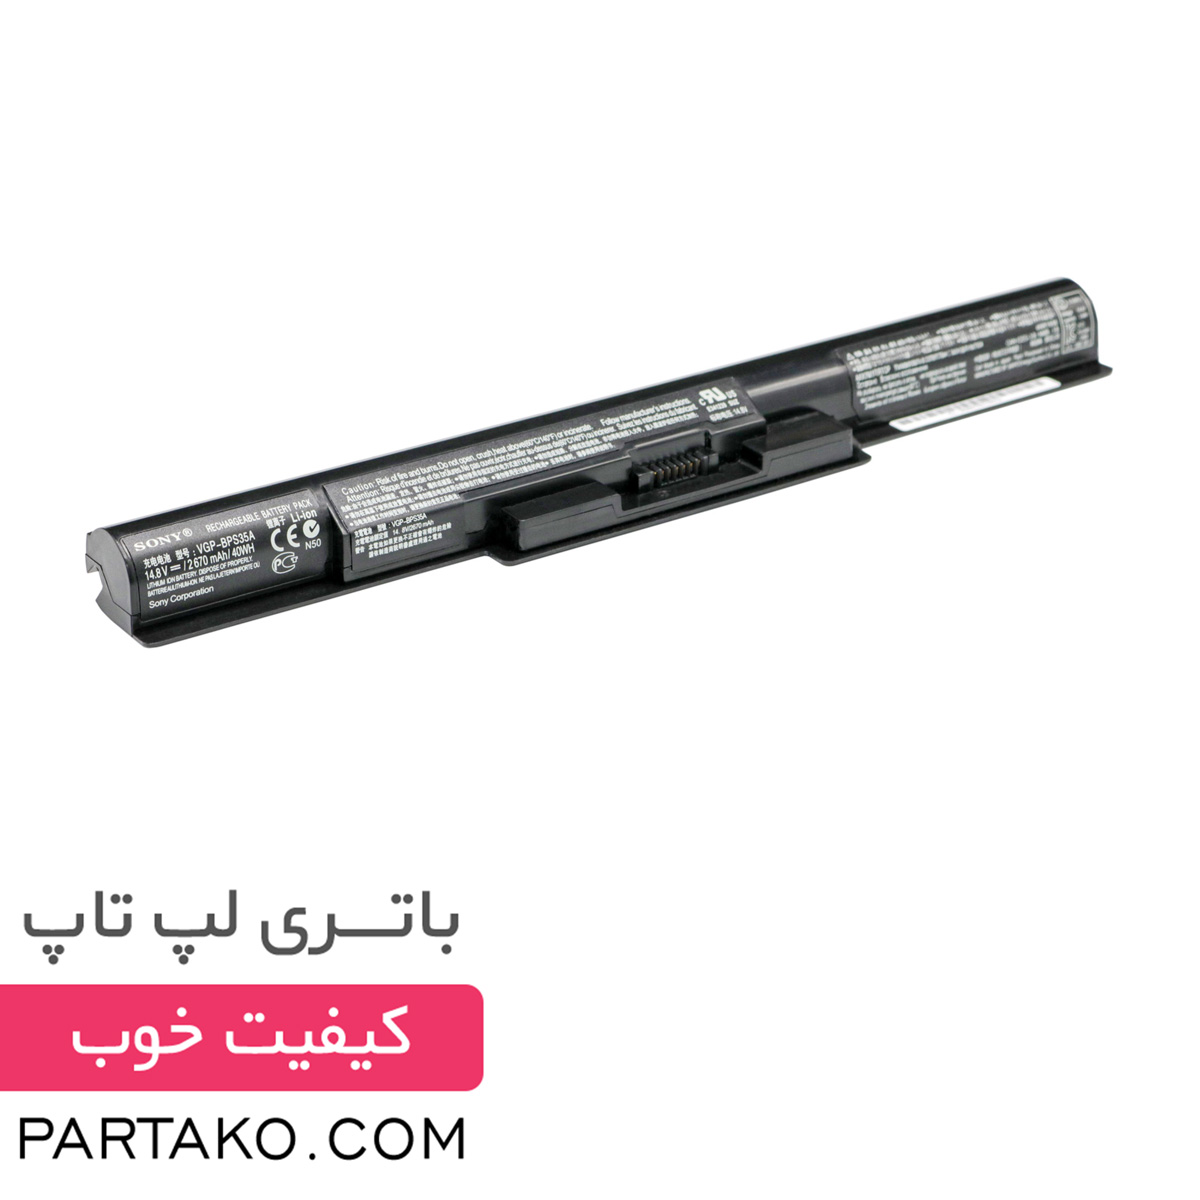 باتری لپ تاپ سونی Laptop Battery Sony Vaio BPS35